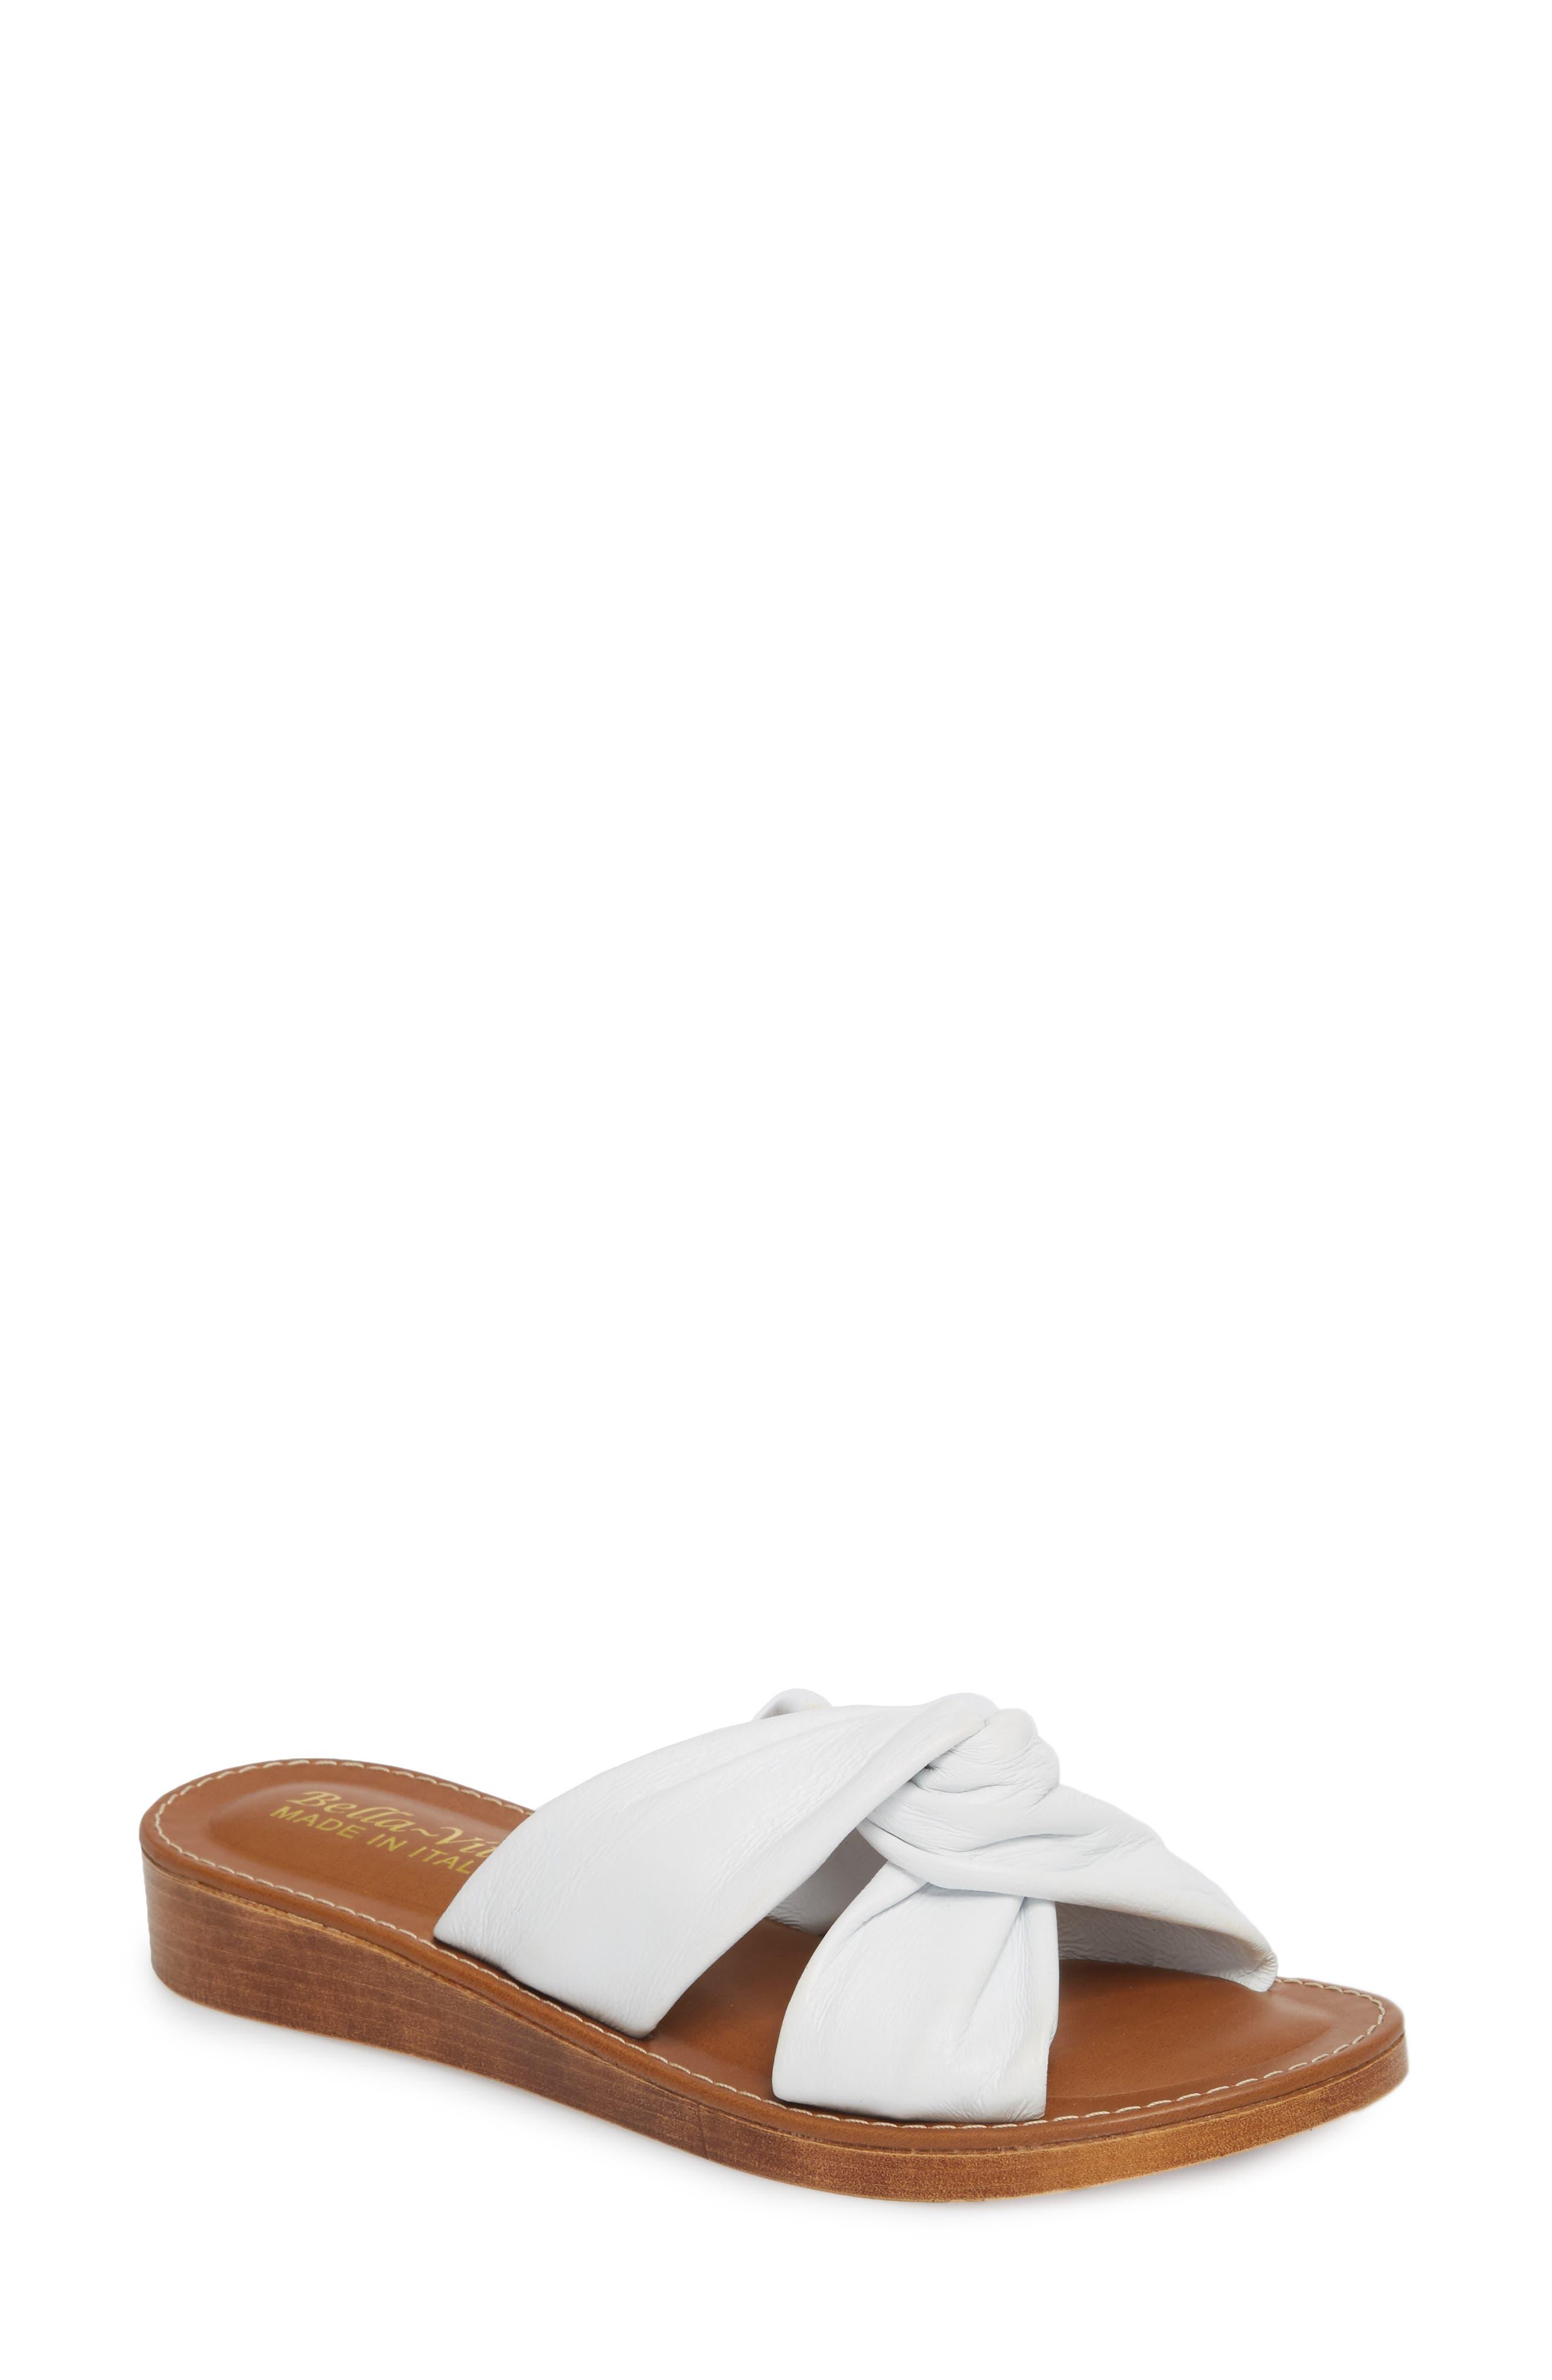 Noa Slide Sandal,                         Main,                         color, White Leather